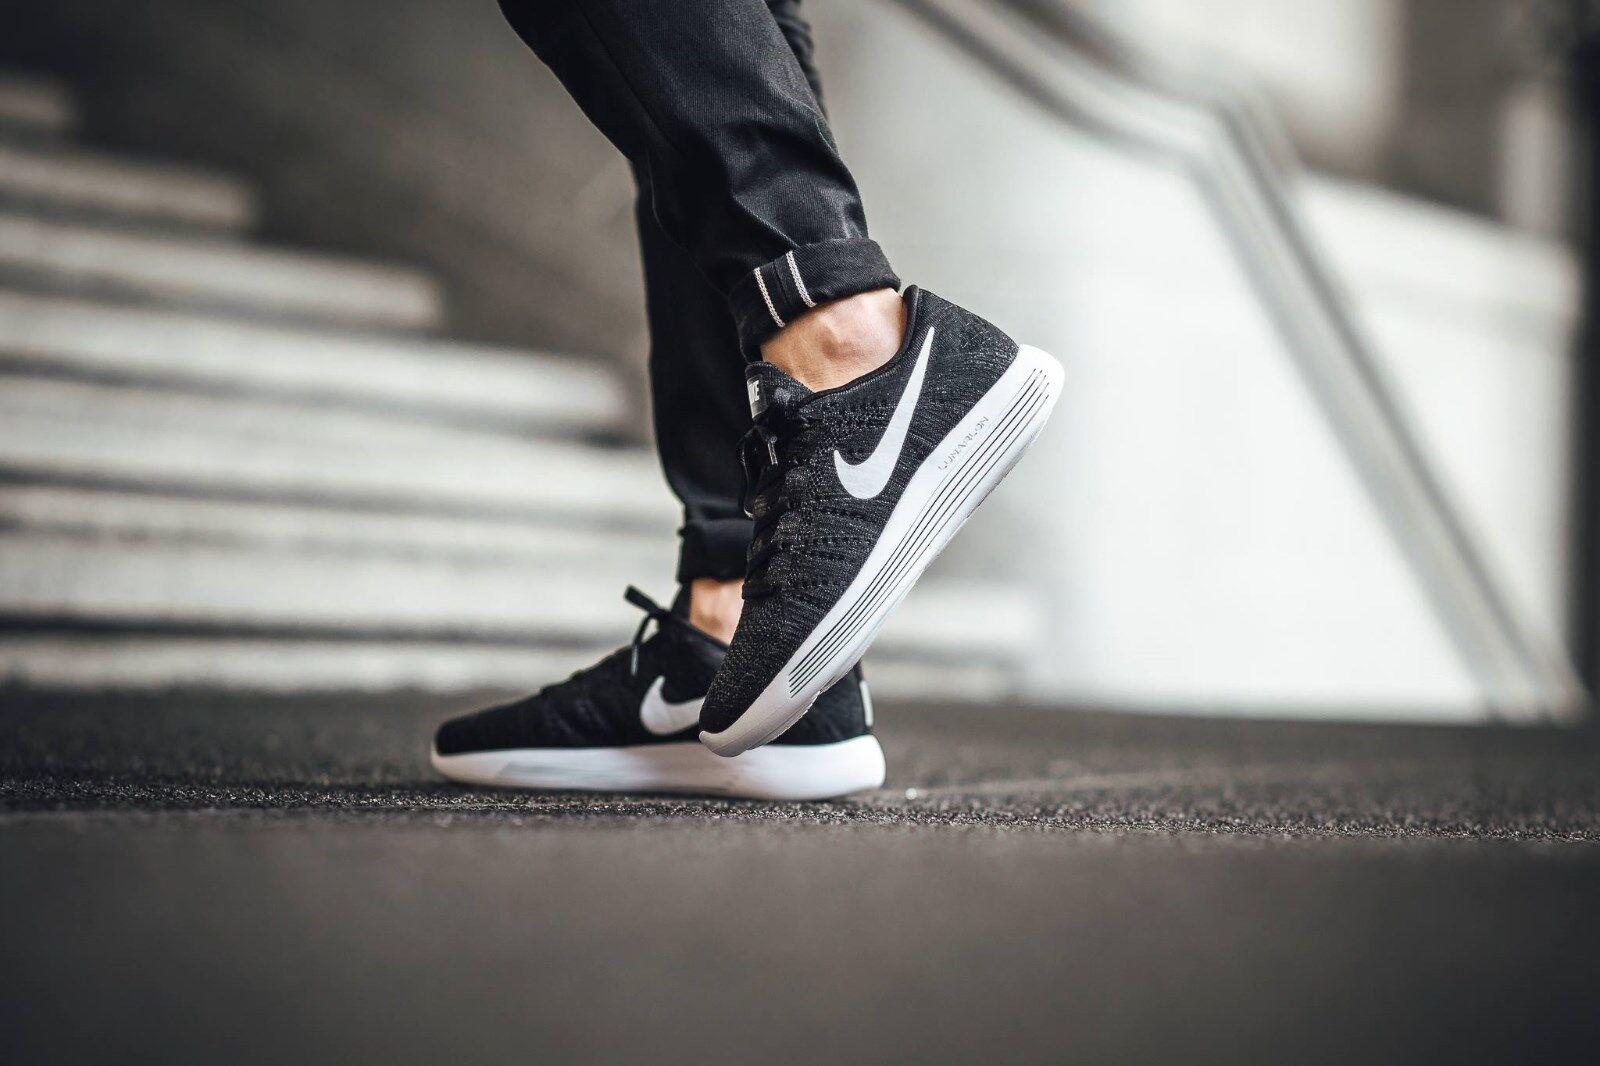 Men's Nike Flyknit Lunarepic Running Sneakers New Black White 843764-002 no box